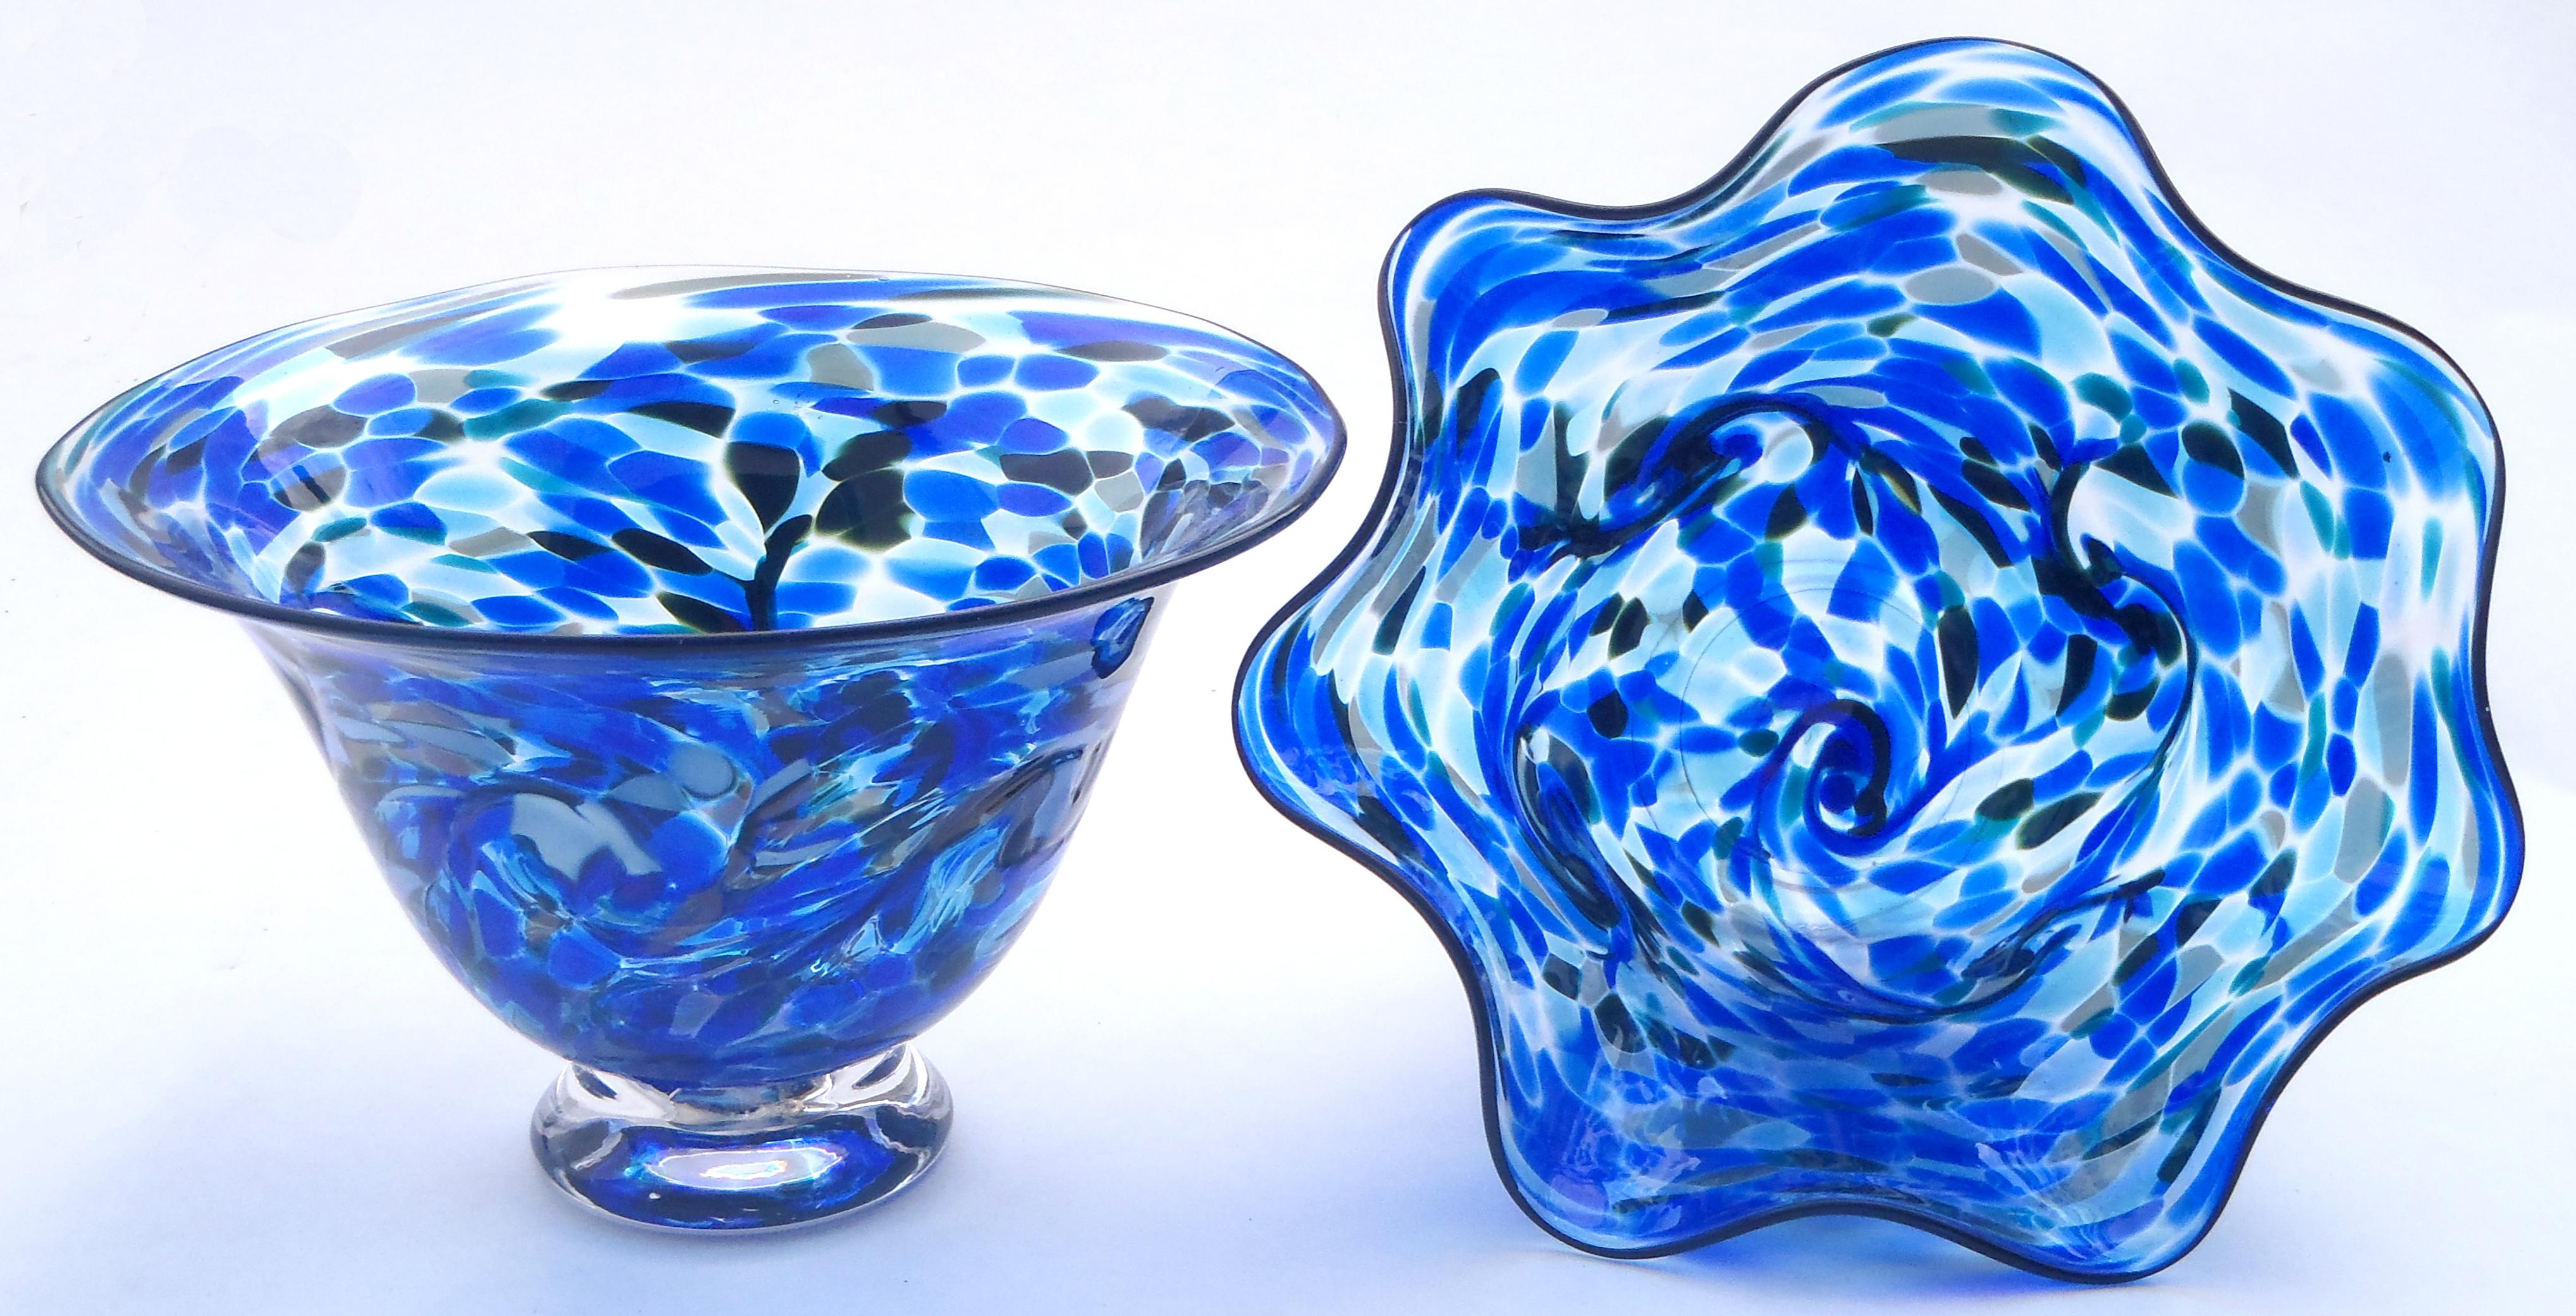 blue-mix-frit-bowls